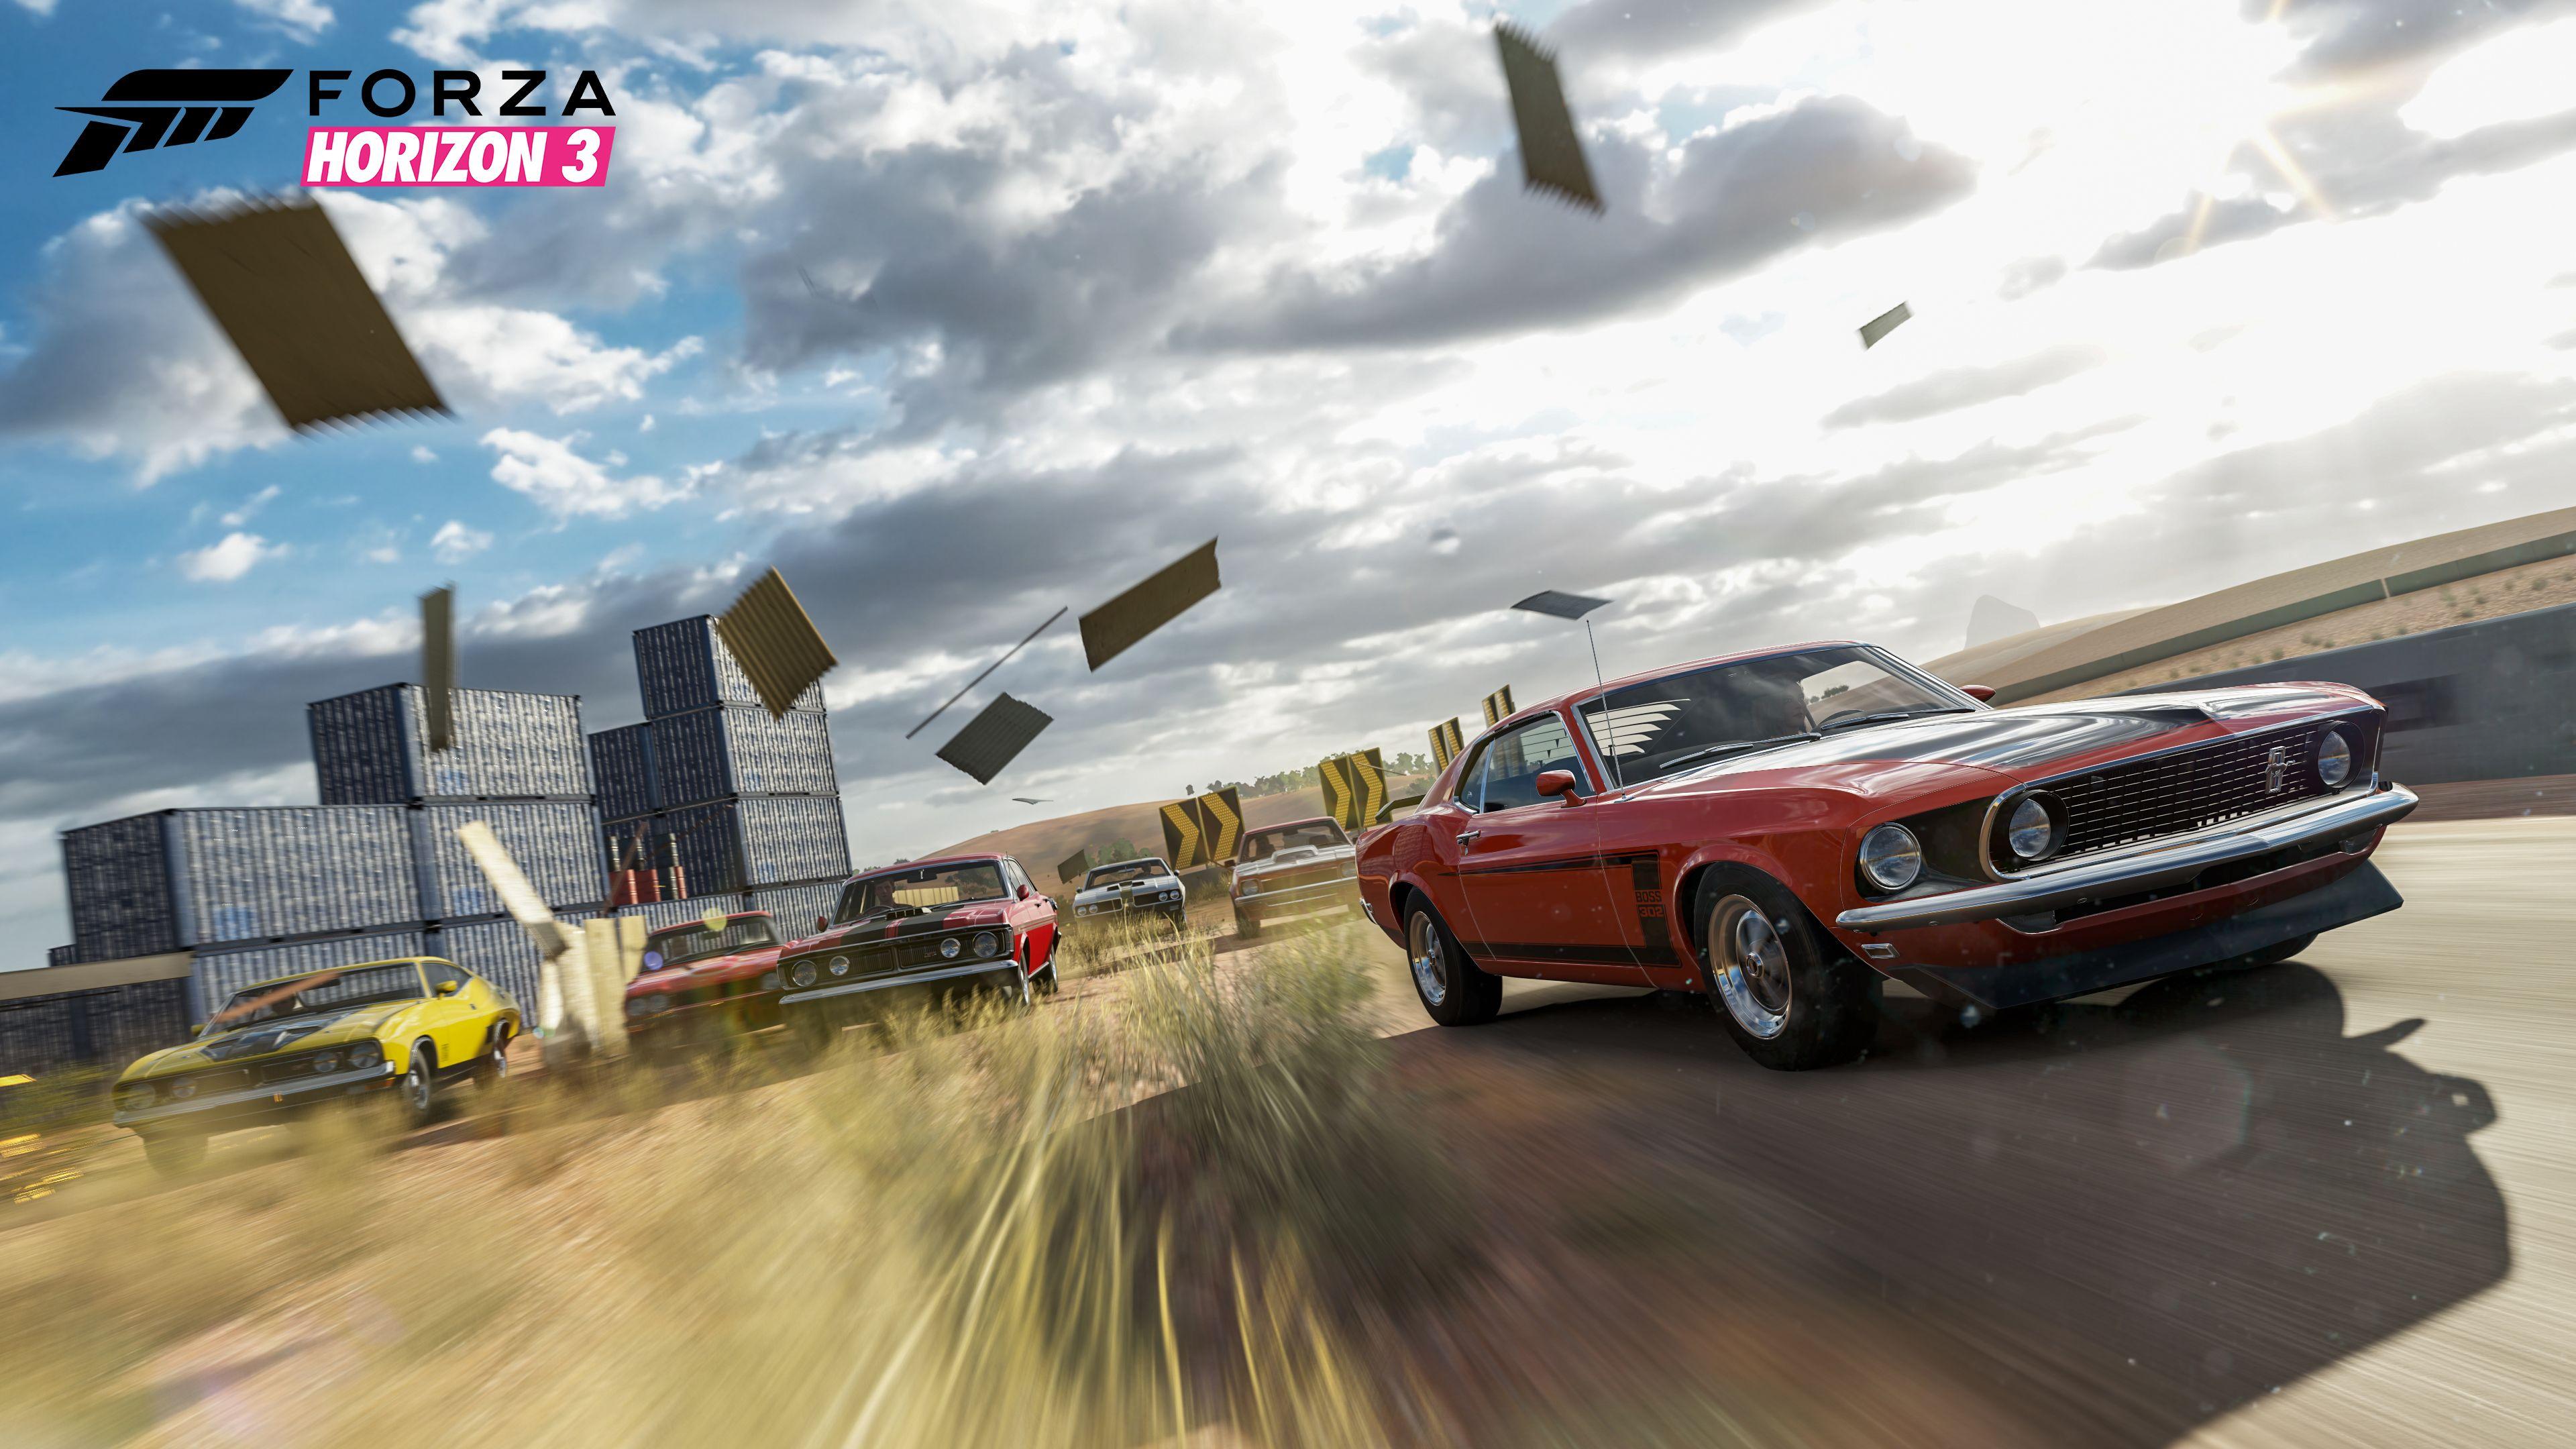 ForzaHorizon3_Gamescom_ClassicsBoxSmash_WM.jpg